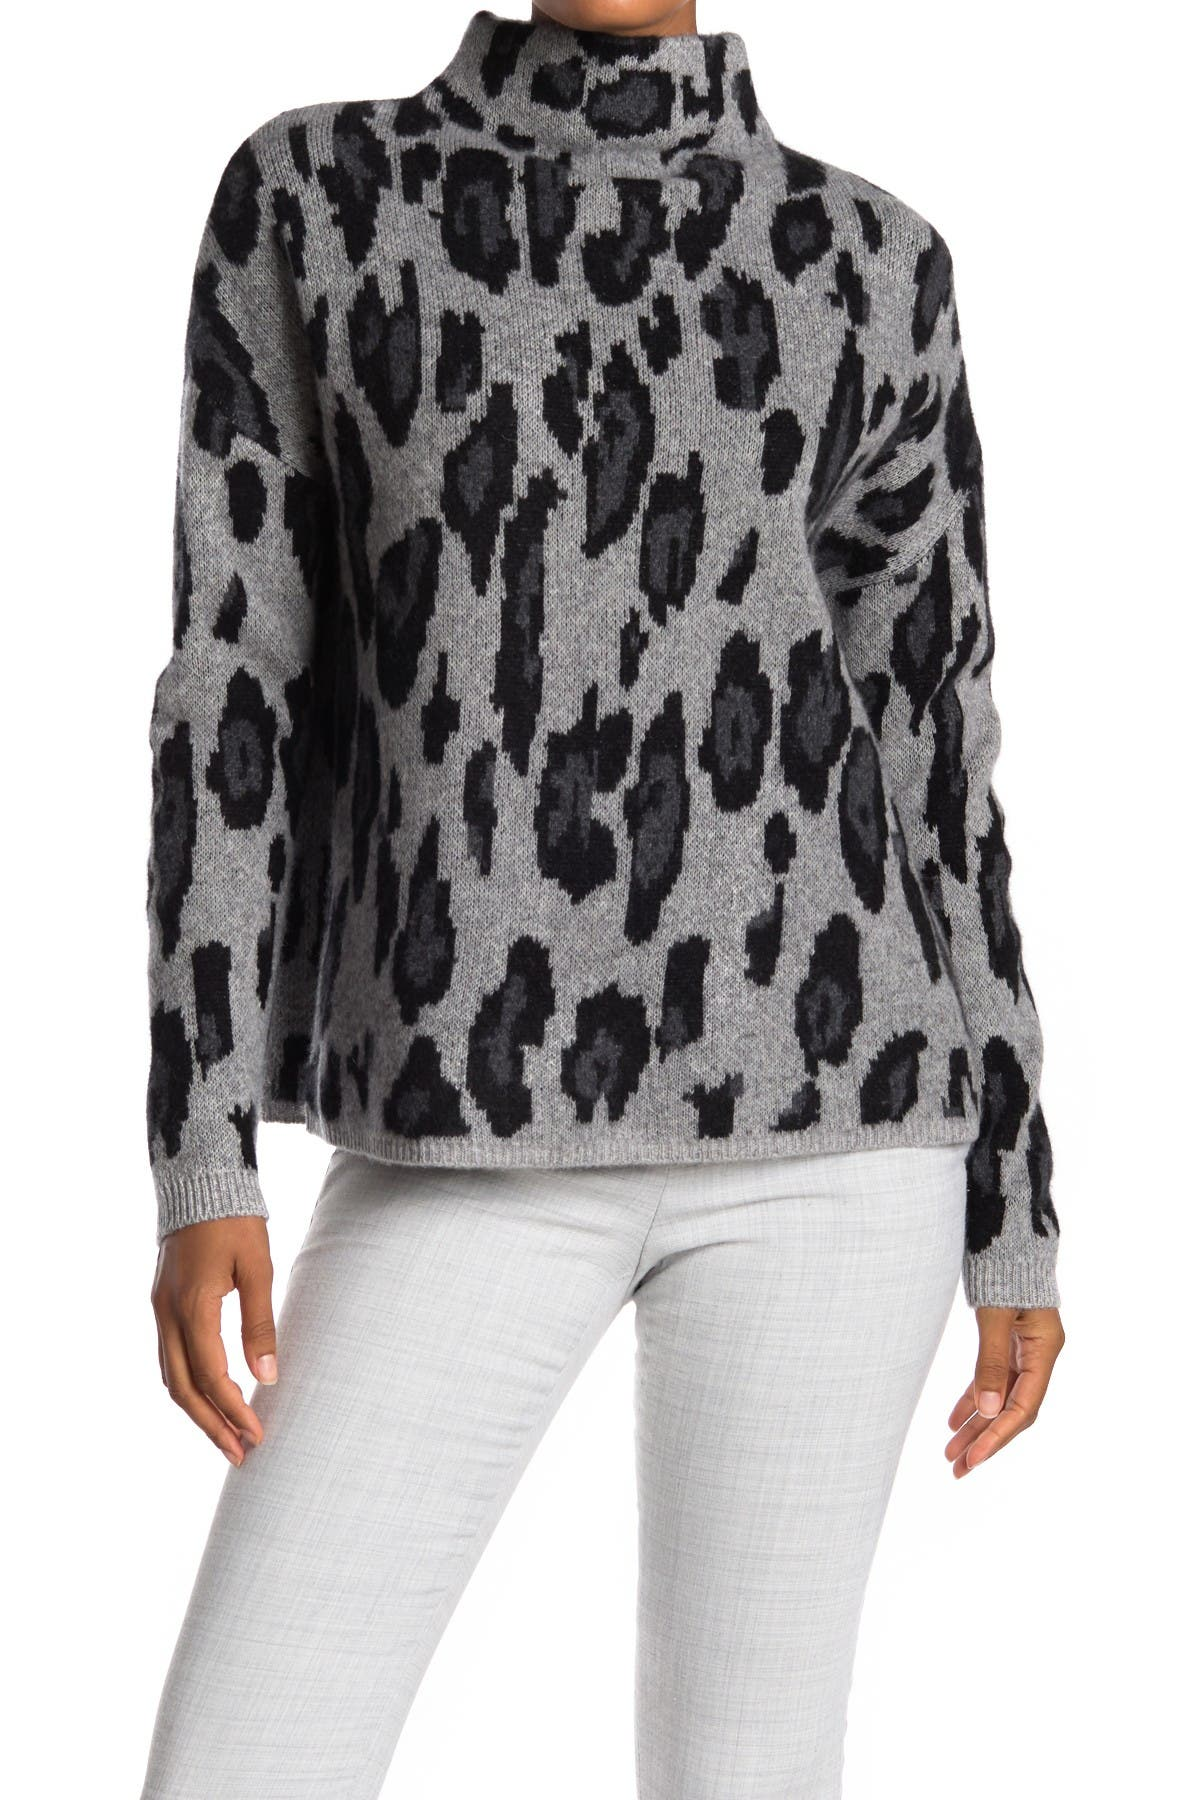 Image of Catherine Catherine Malandrino Leopard Print Mock Neck Cashmere Sweater